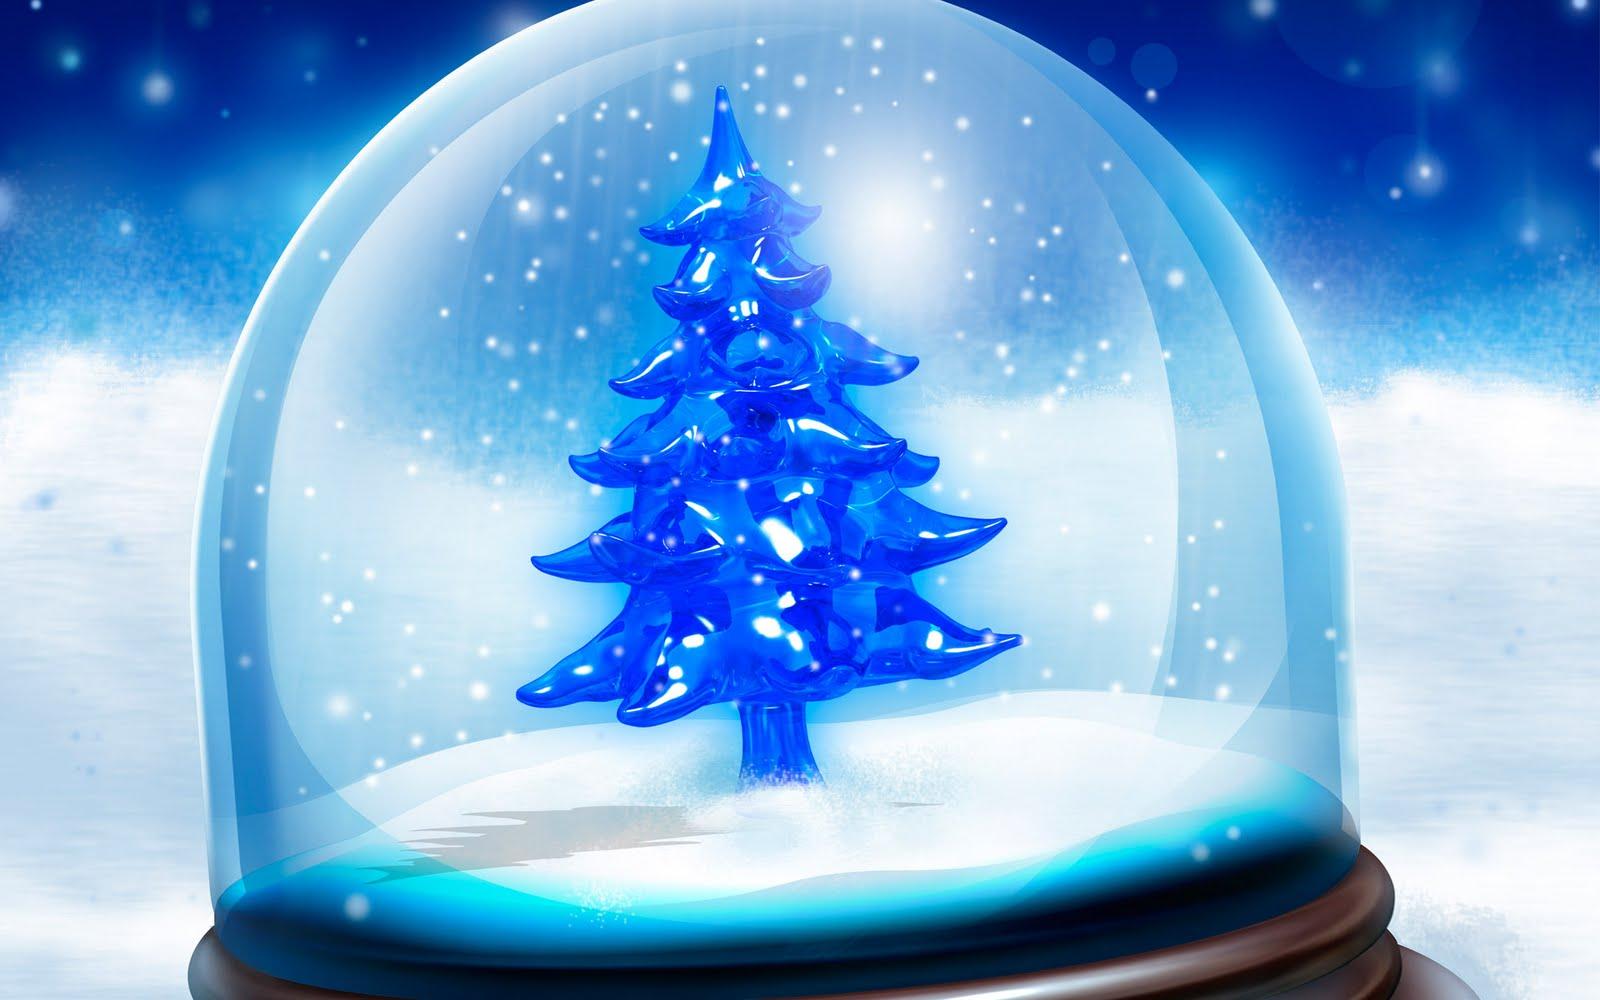 https://1.bp.blogspot.com/_qCfXnBMknJE/TQCvAkAkUpI/AAAAAAAABAw/ay3uuVPflkY/s1600/high-definition-christmas-wallpapers.jpg